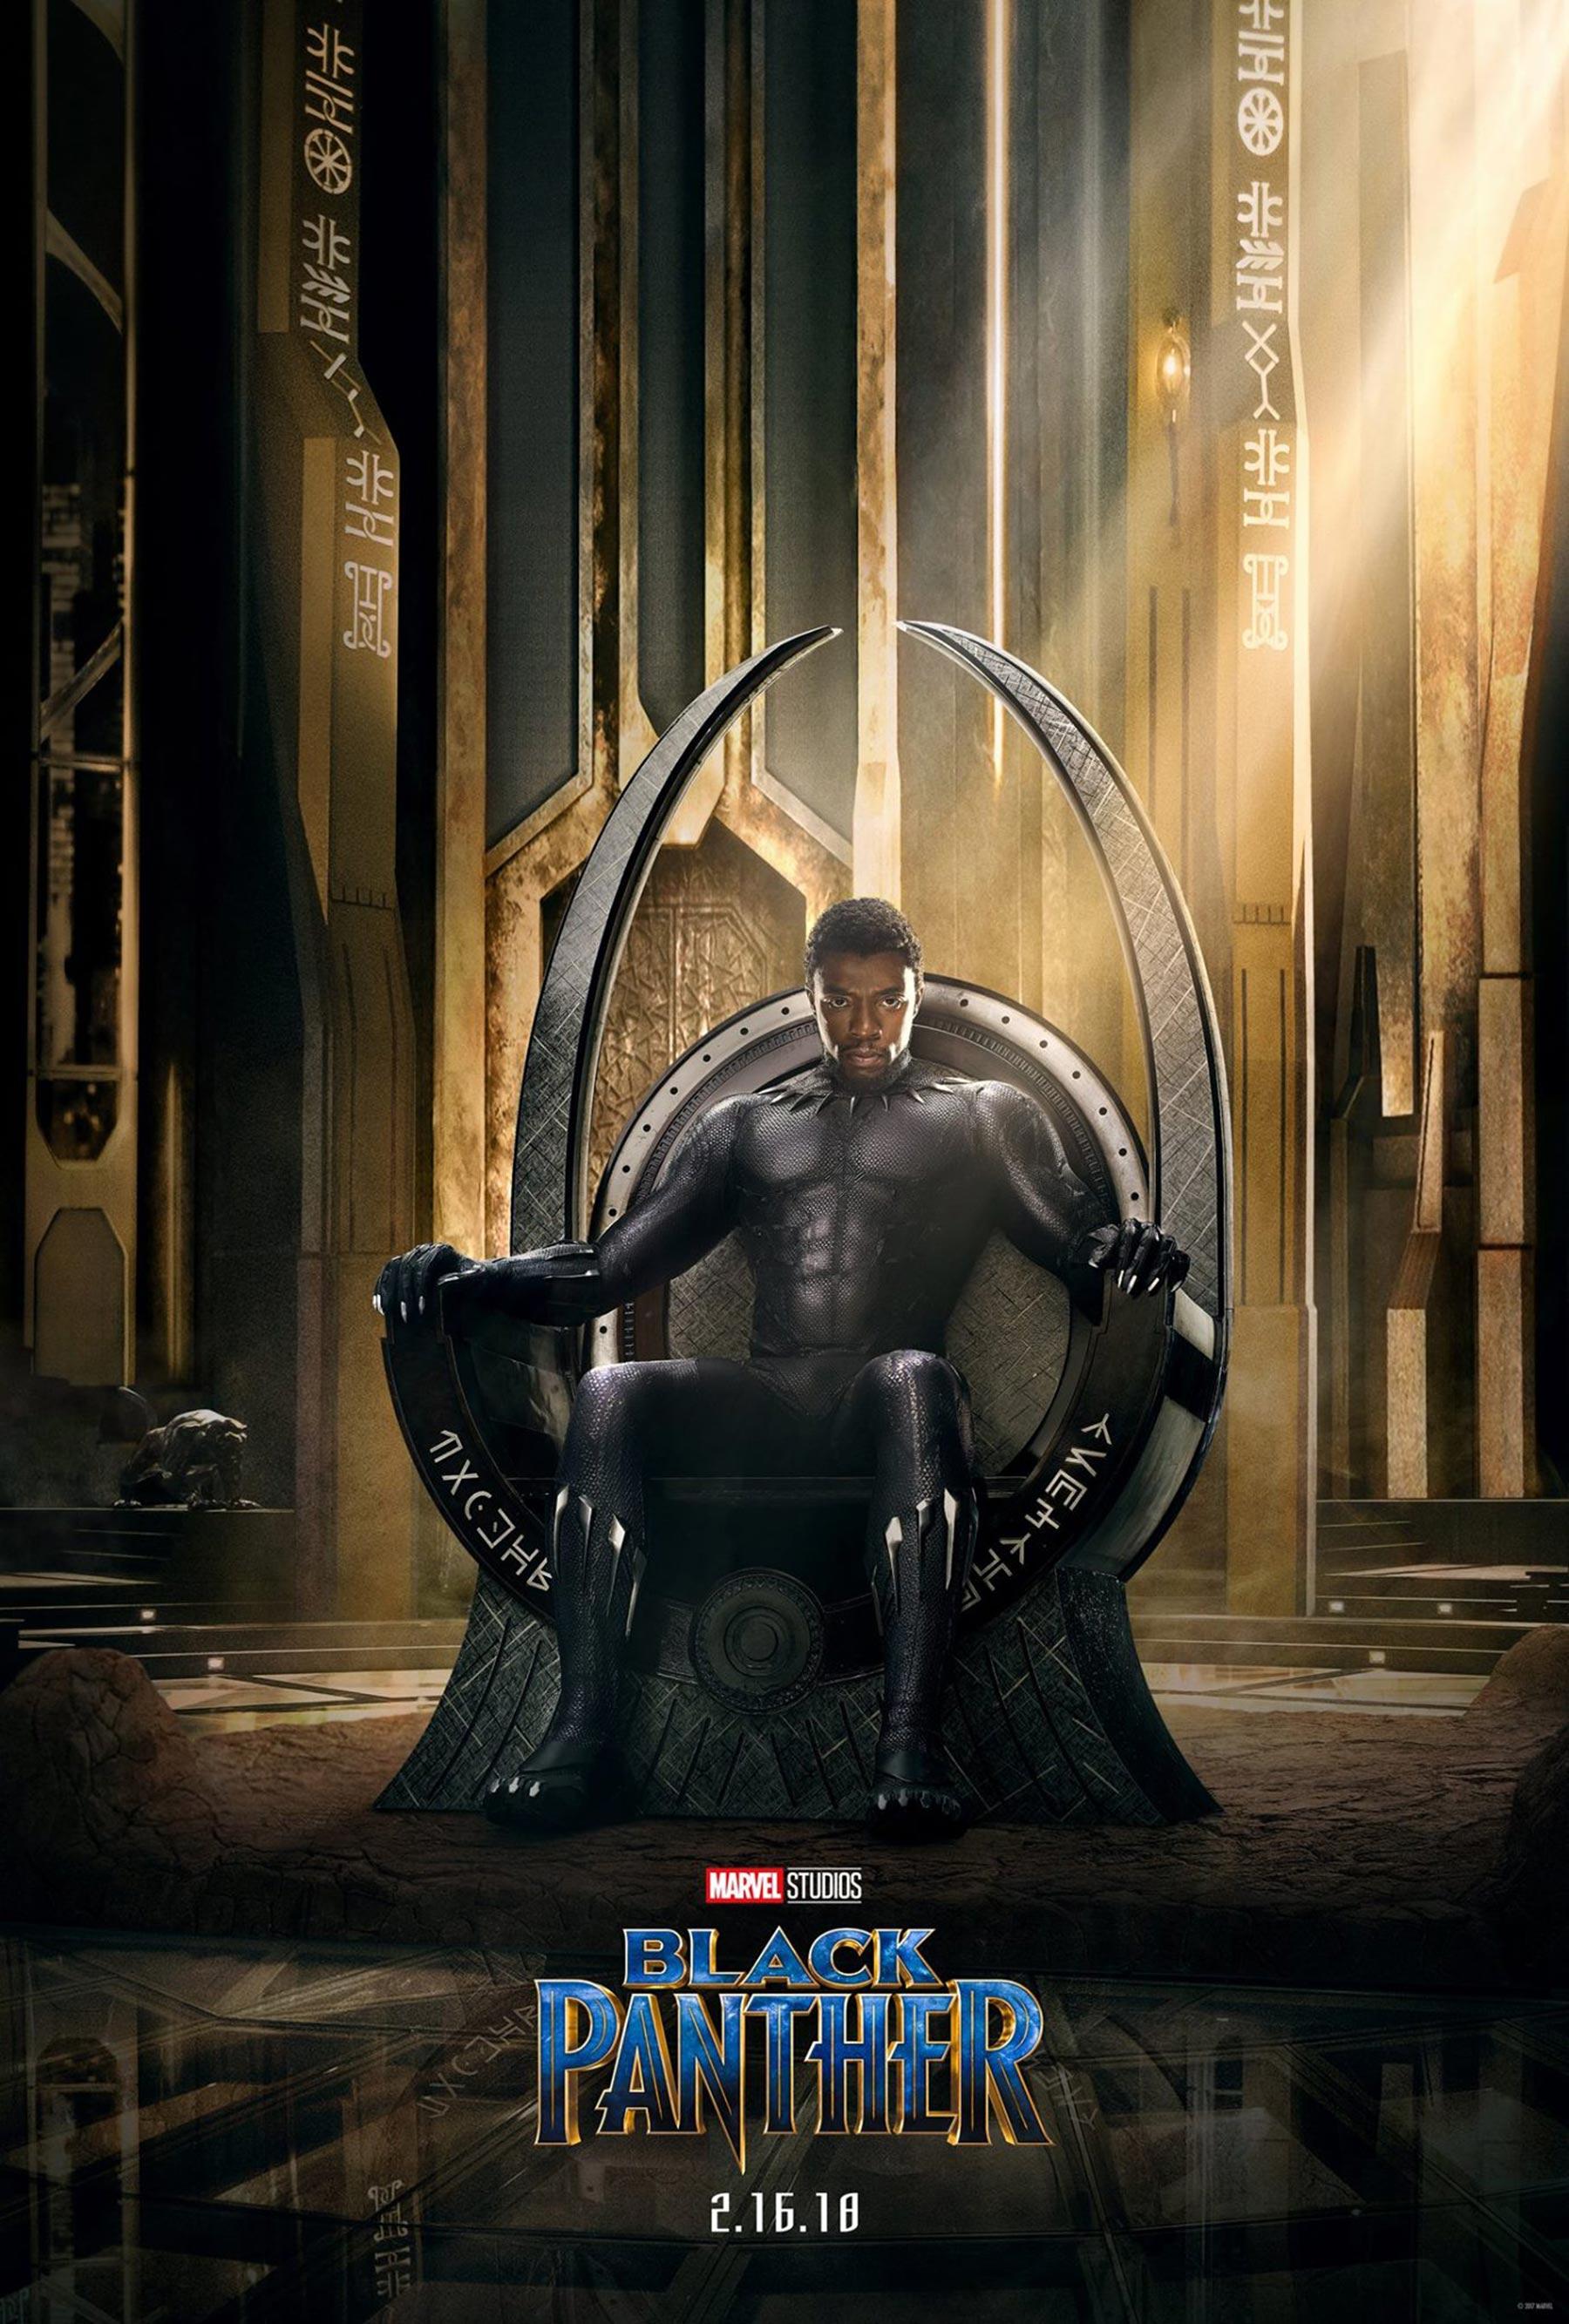 'Black Panther' Crosses $1 Billion Mark In Box Office Milestone